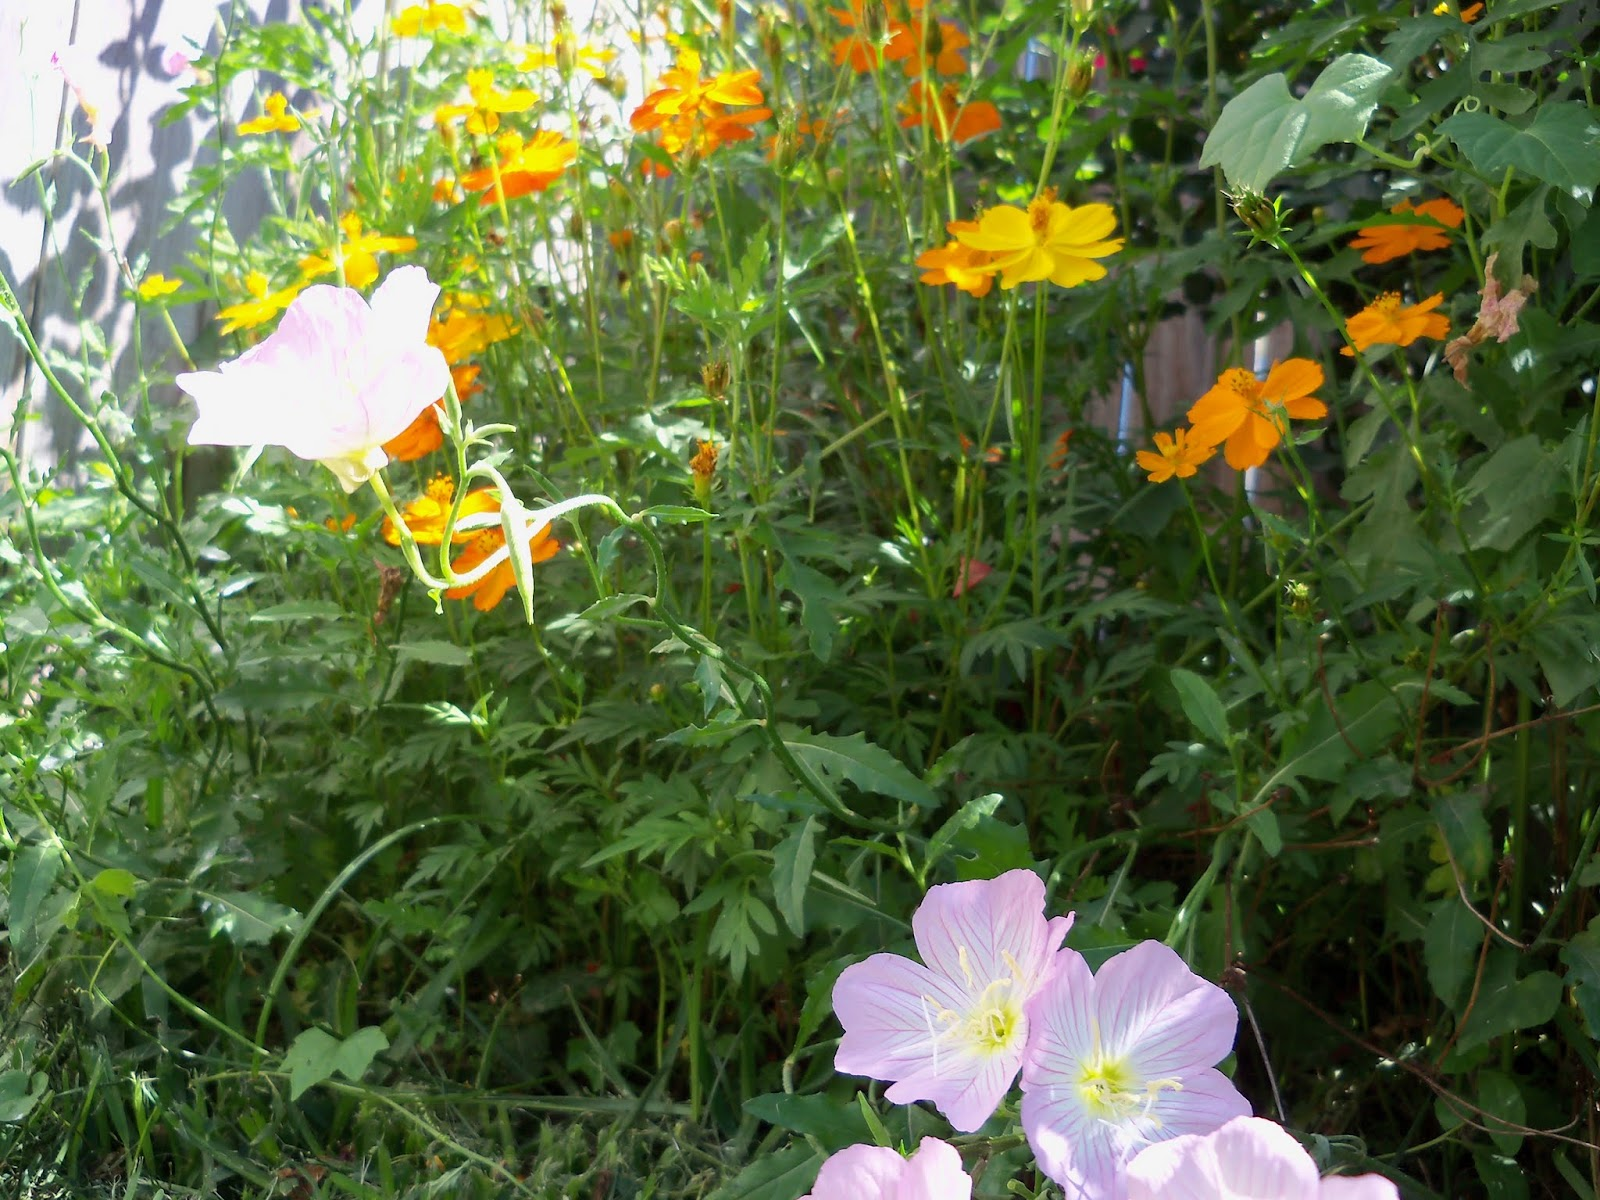 Gardening 2013 - 115_6202.JPG